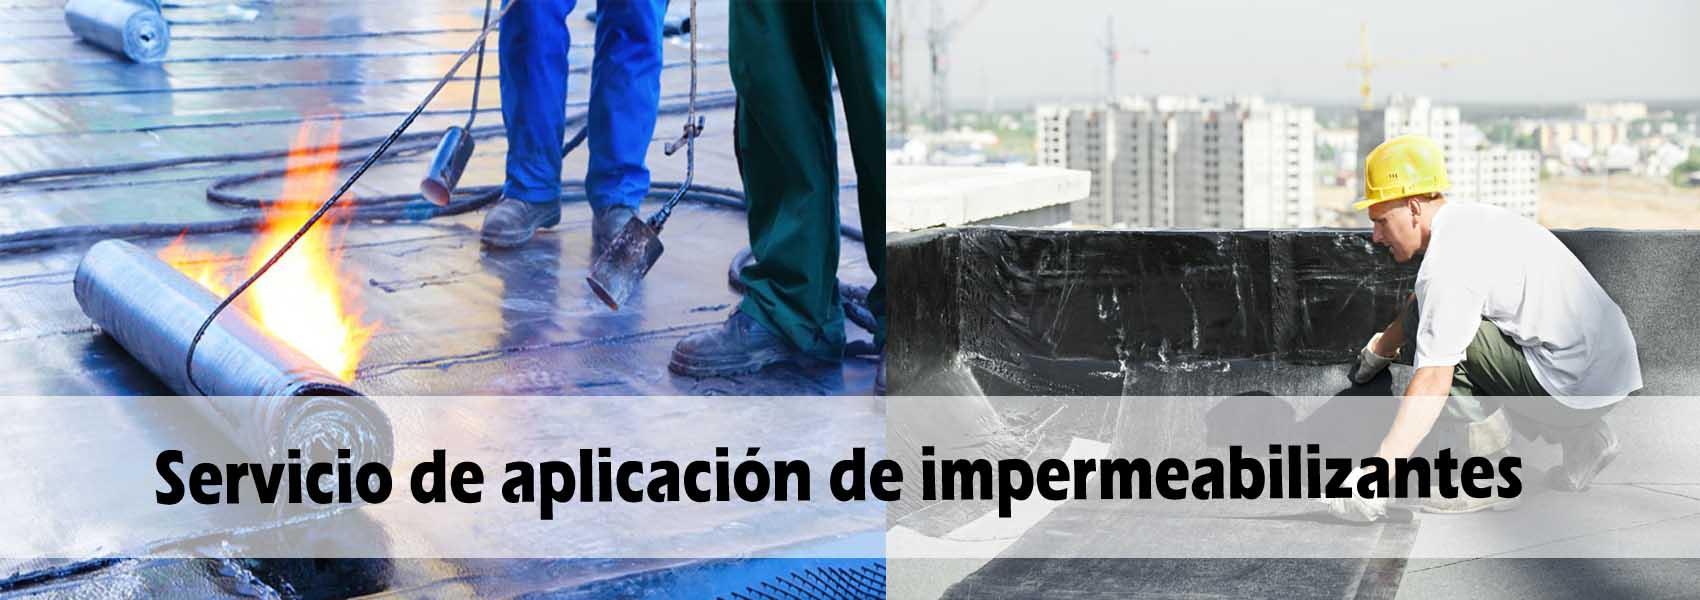 servicio-de-aplicacion-de-impermeabilizante